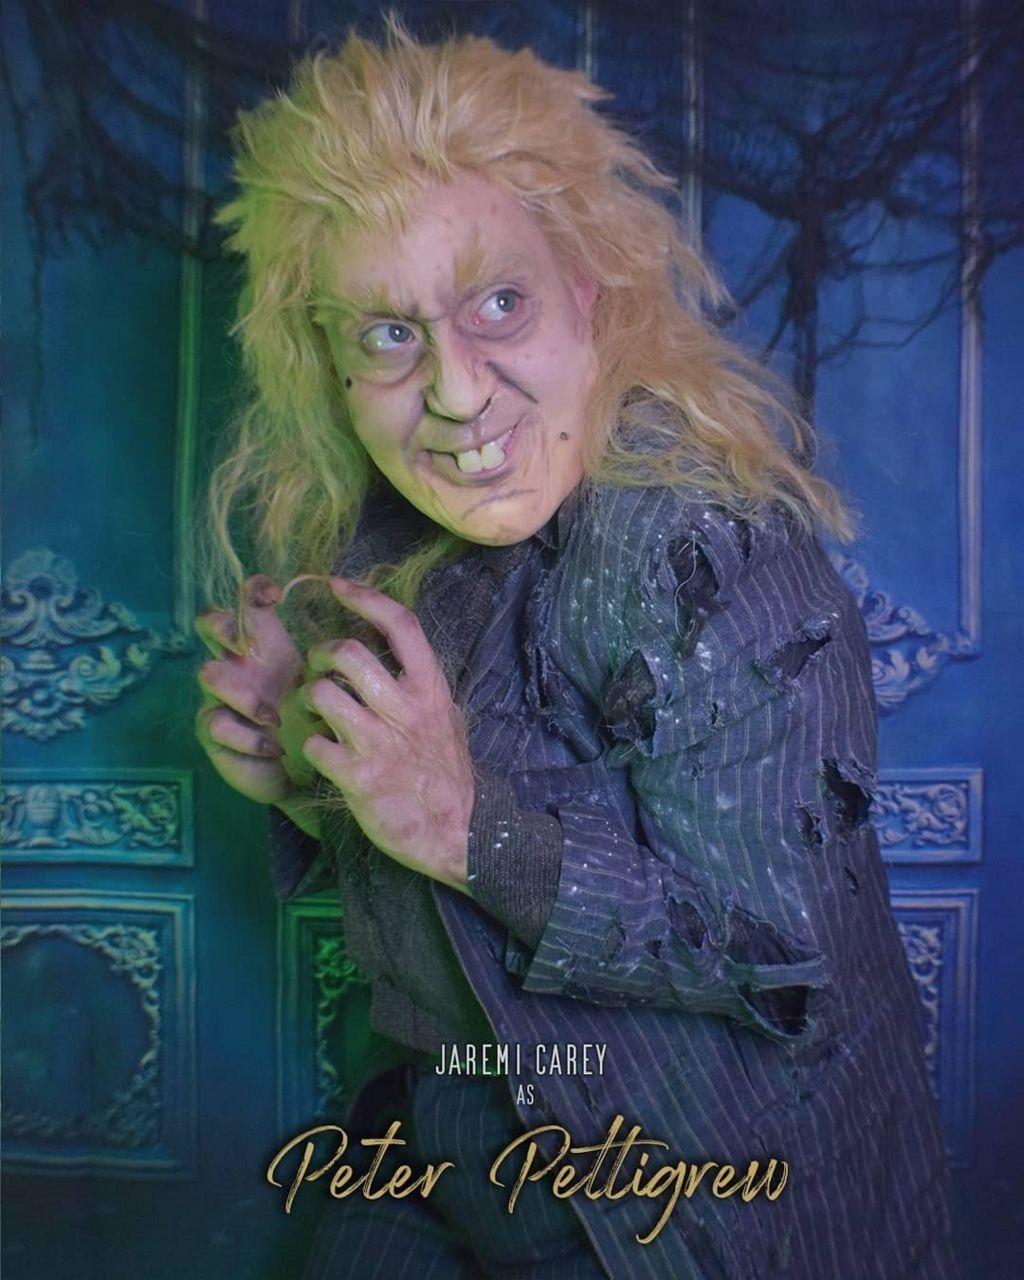 Jaremi Carey as Peter Pettigrew